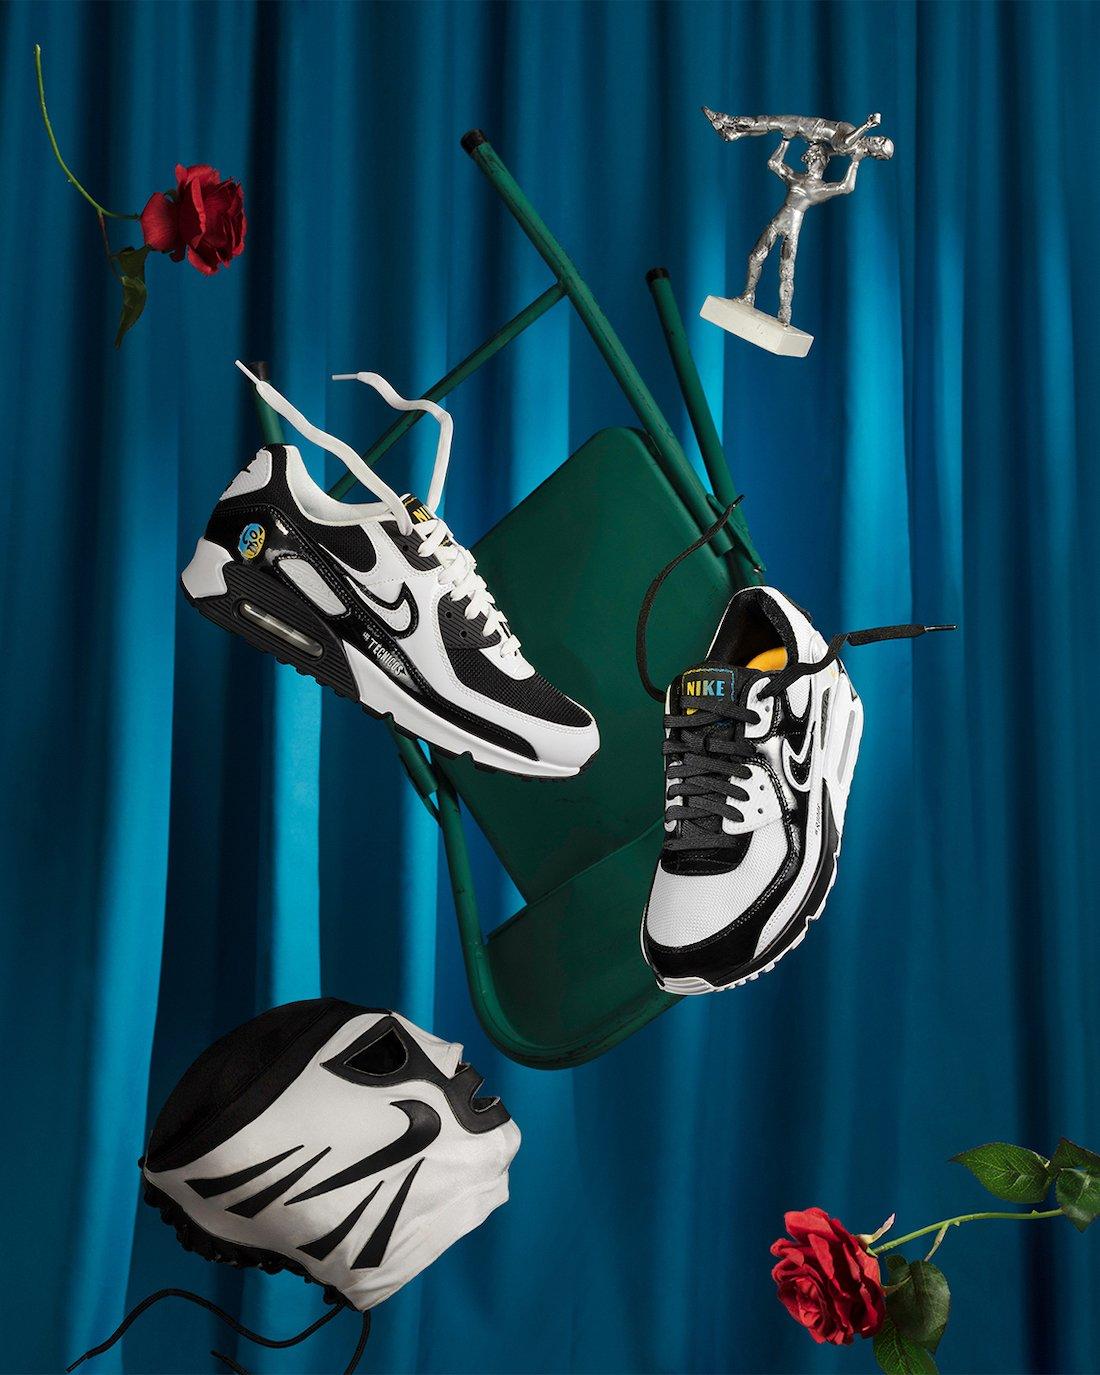 Nike Lucha Libre Air Max 90 Release Date Info